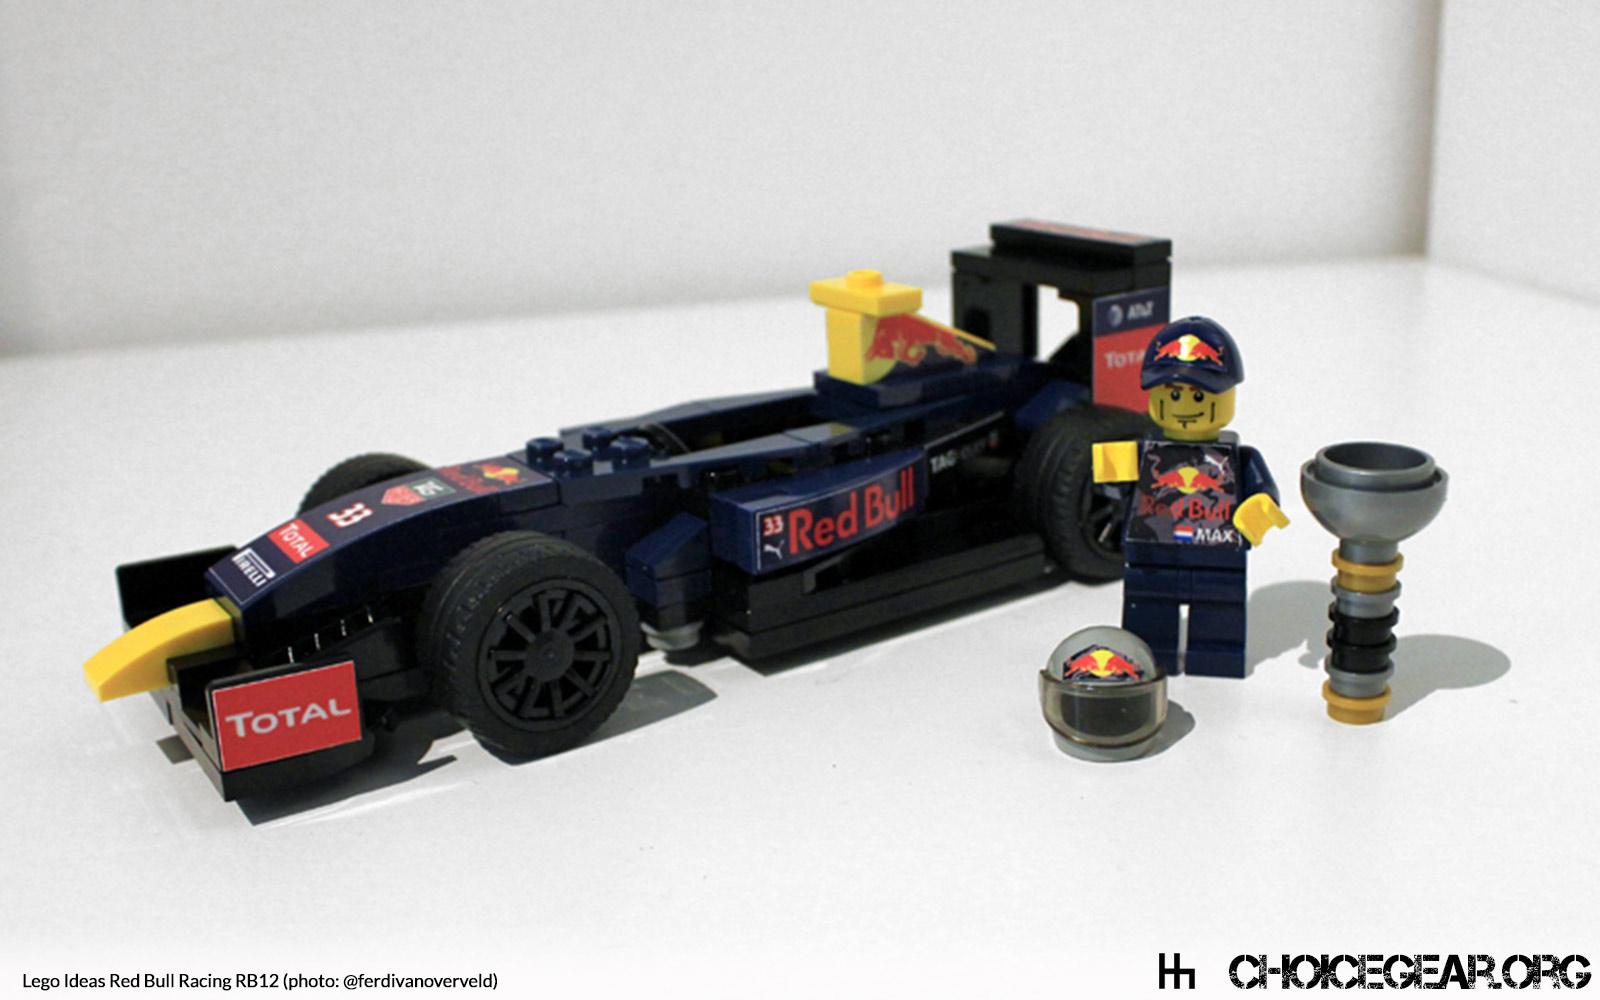 Deck Lights Auto Electrical Wiring Diagram Big Horn Isuzu Tod Lego Speed Champions Red Bull Rb12 F1 Car